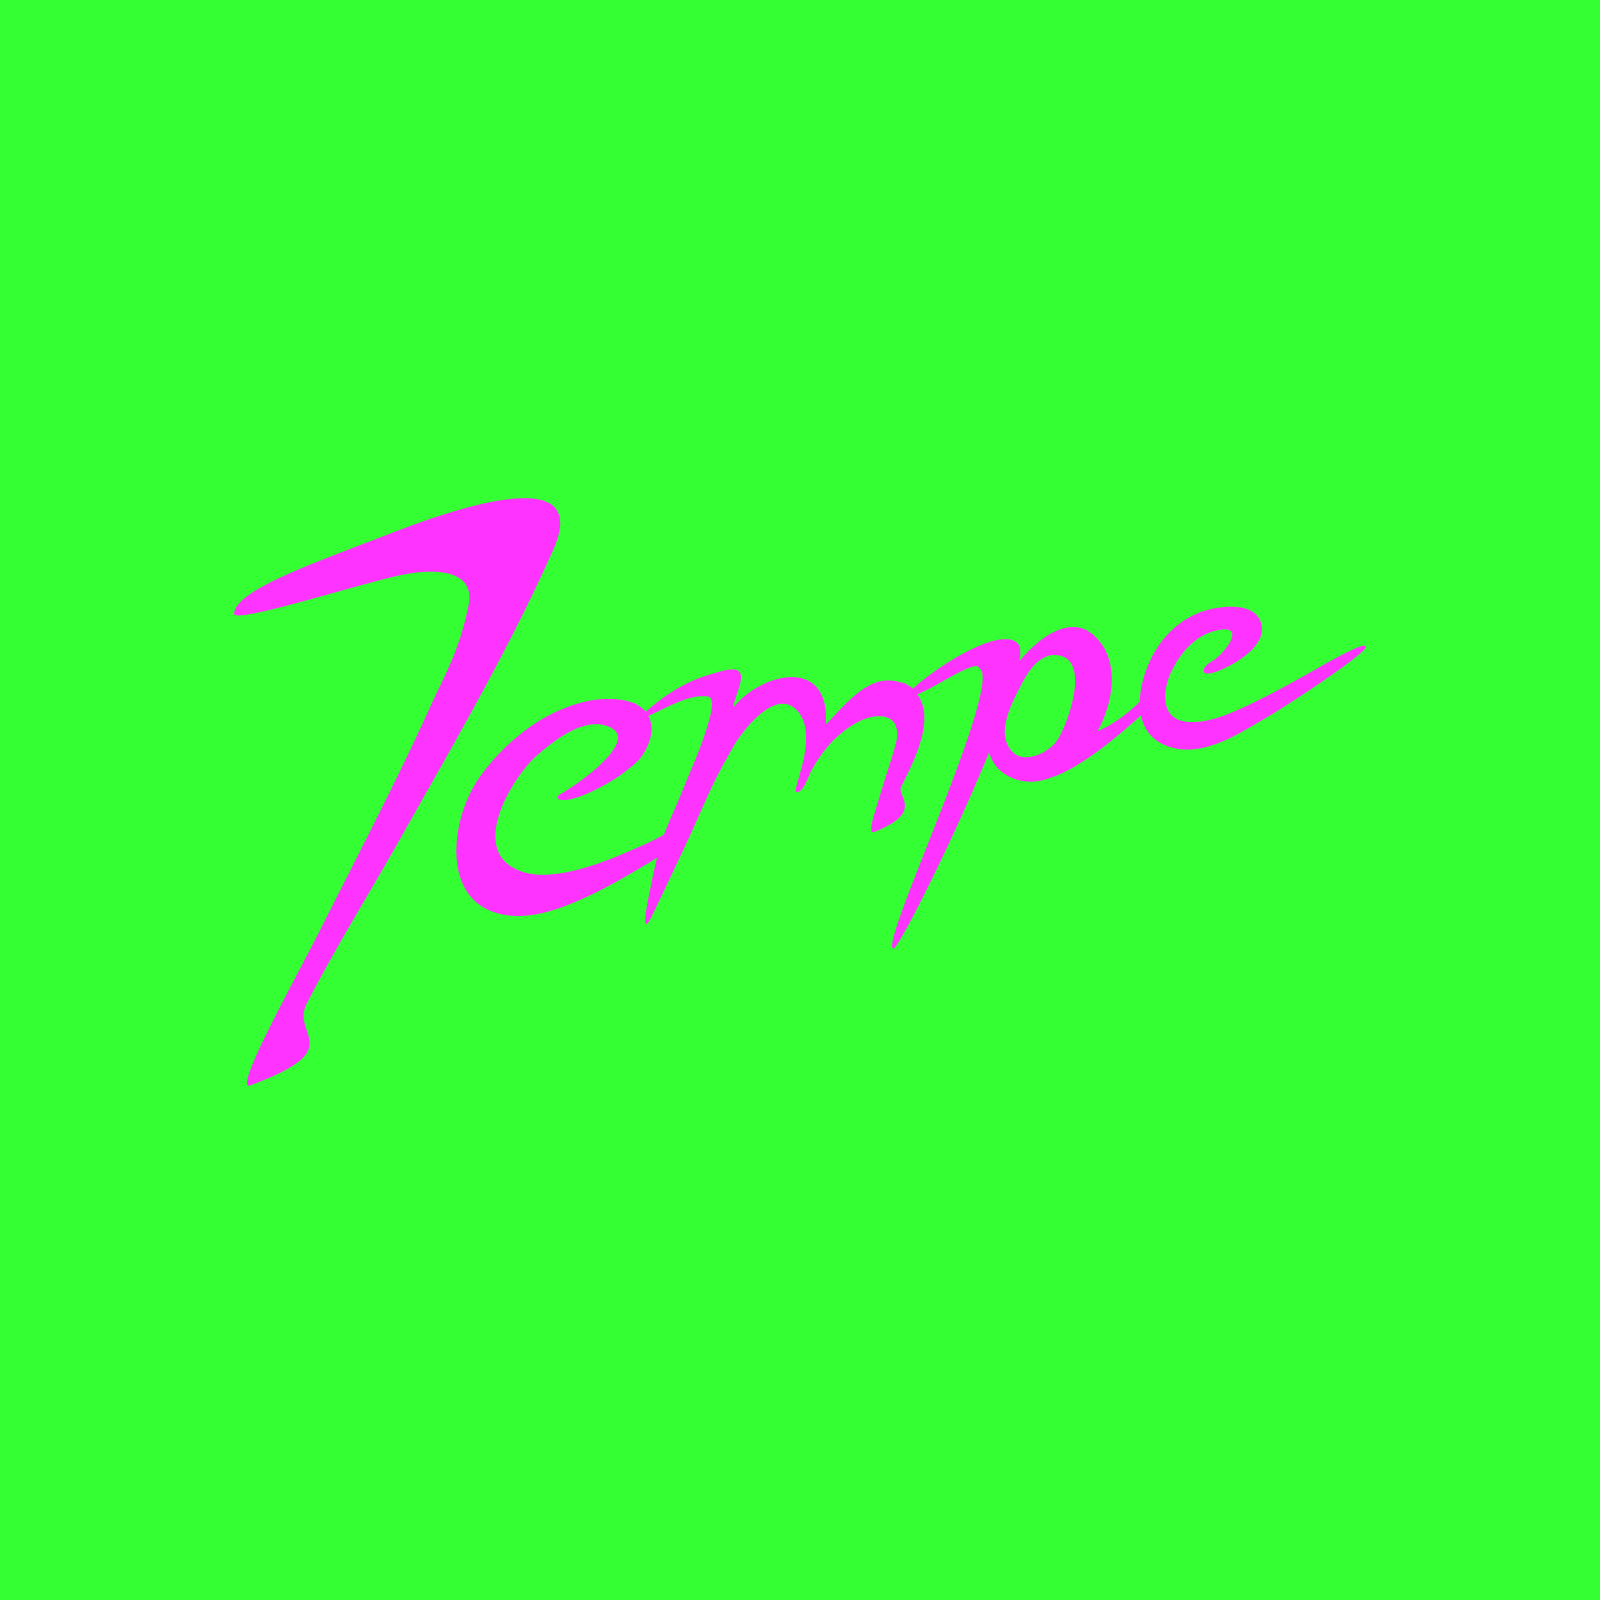 ben_tieni___tempe_1